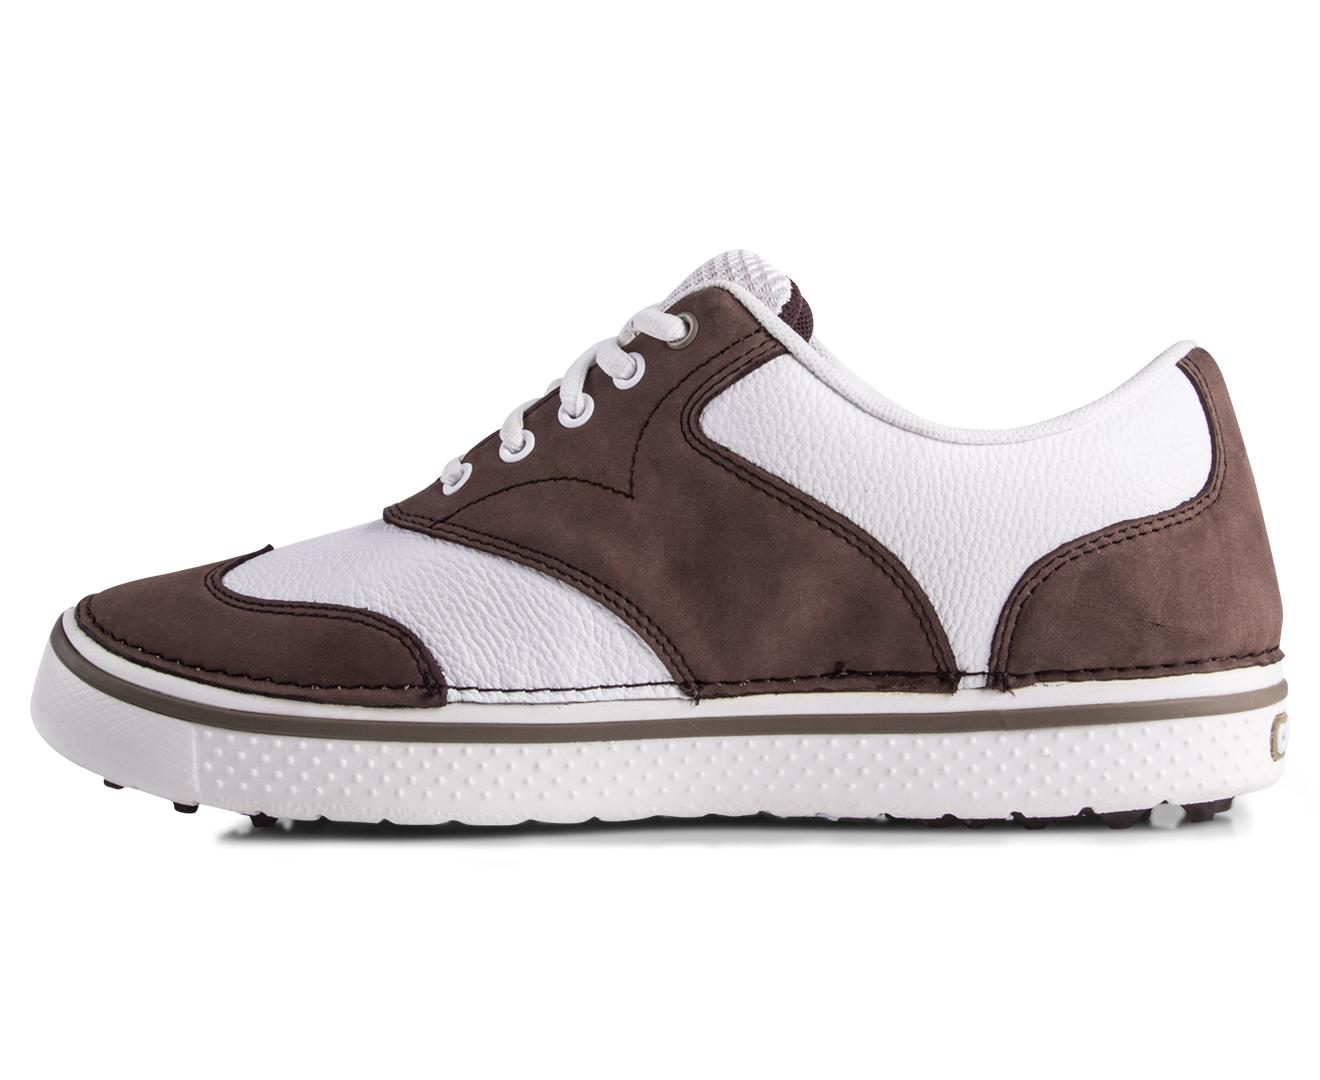 Spikeless Golf Shoes Clearance Australia